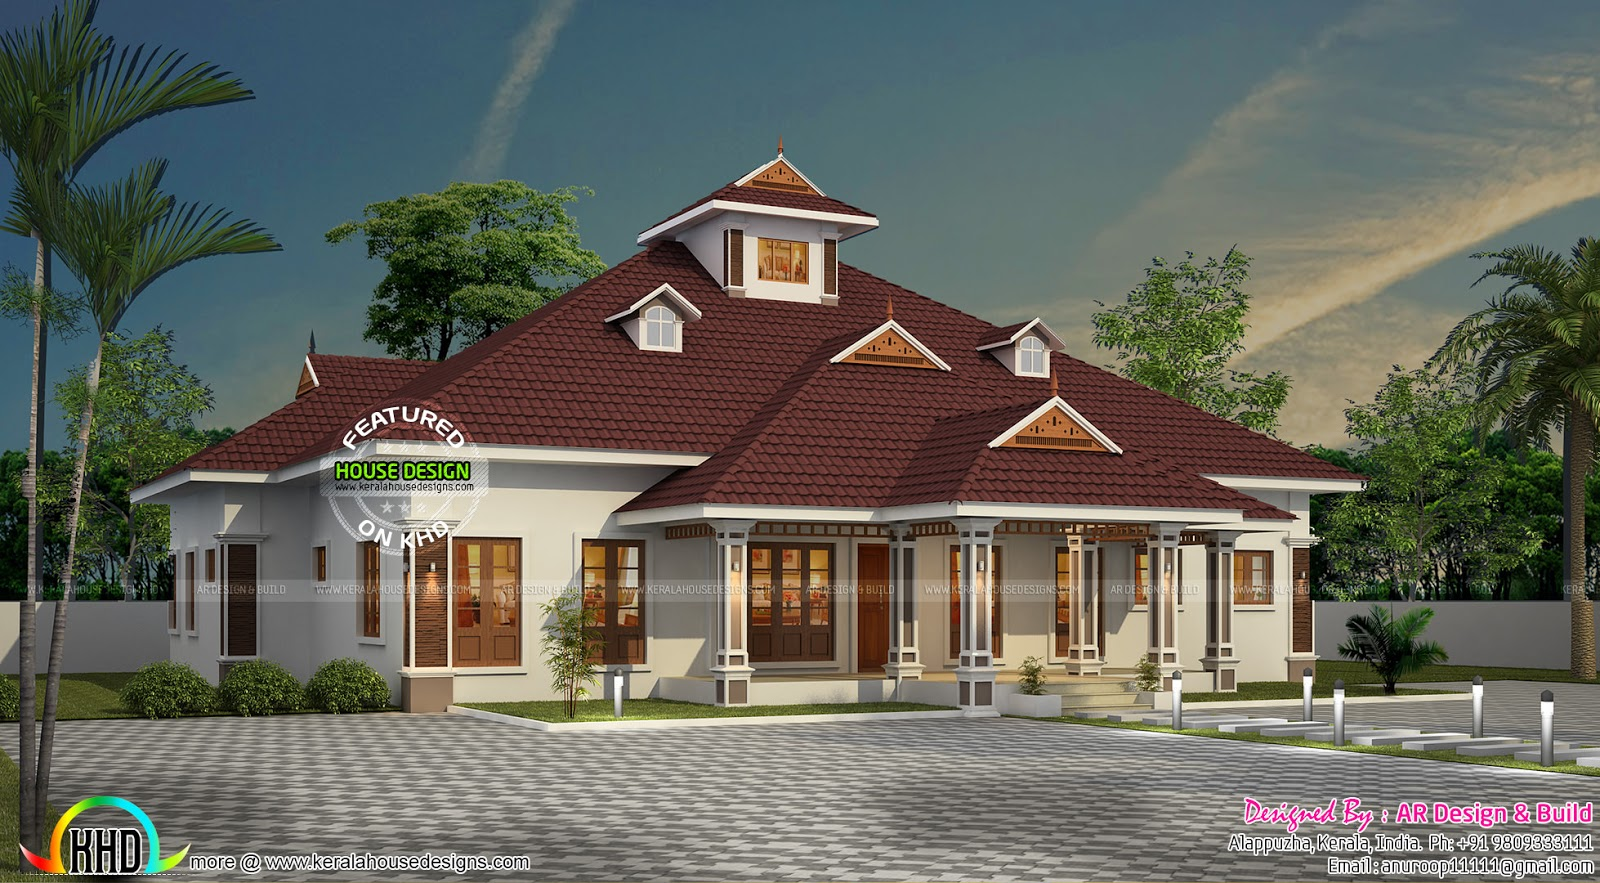 Kerala Model Home With Dormer Windows Kerala Home Design